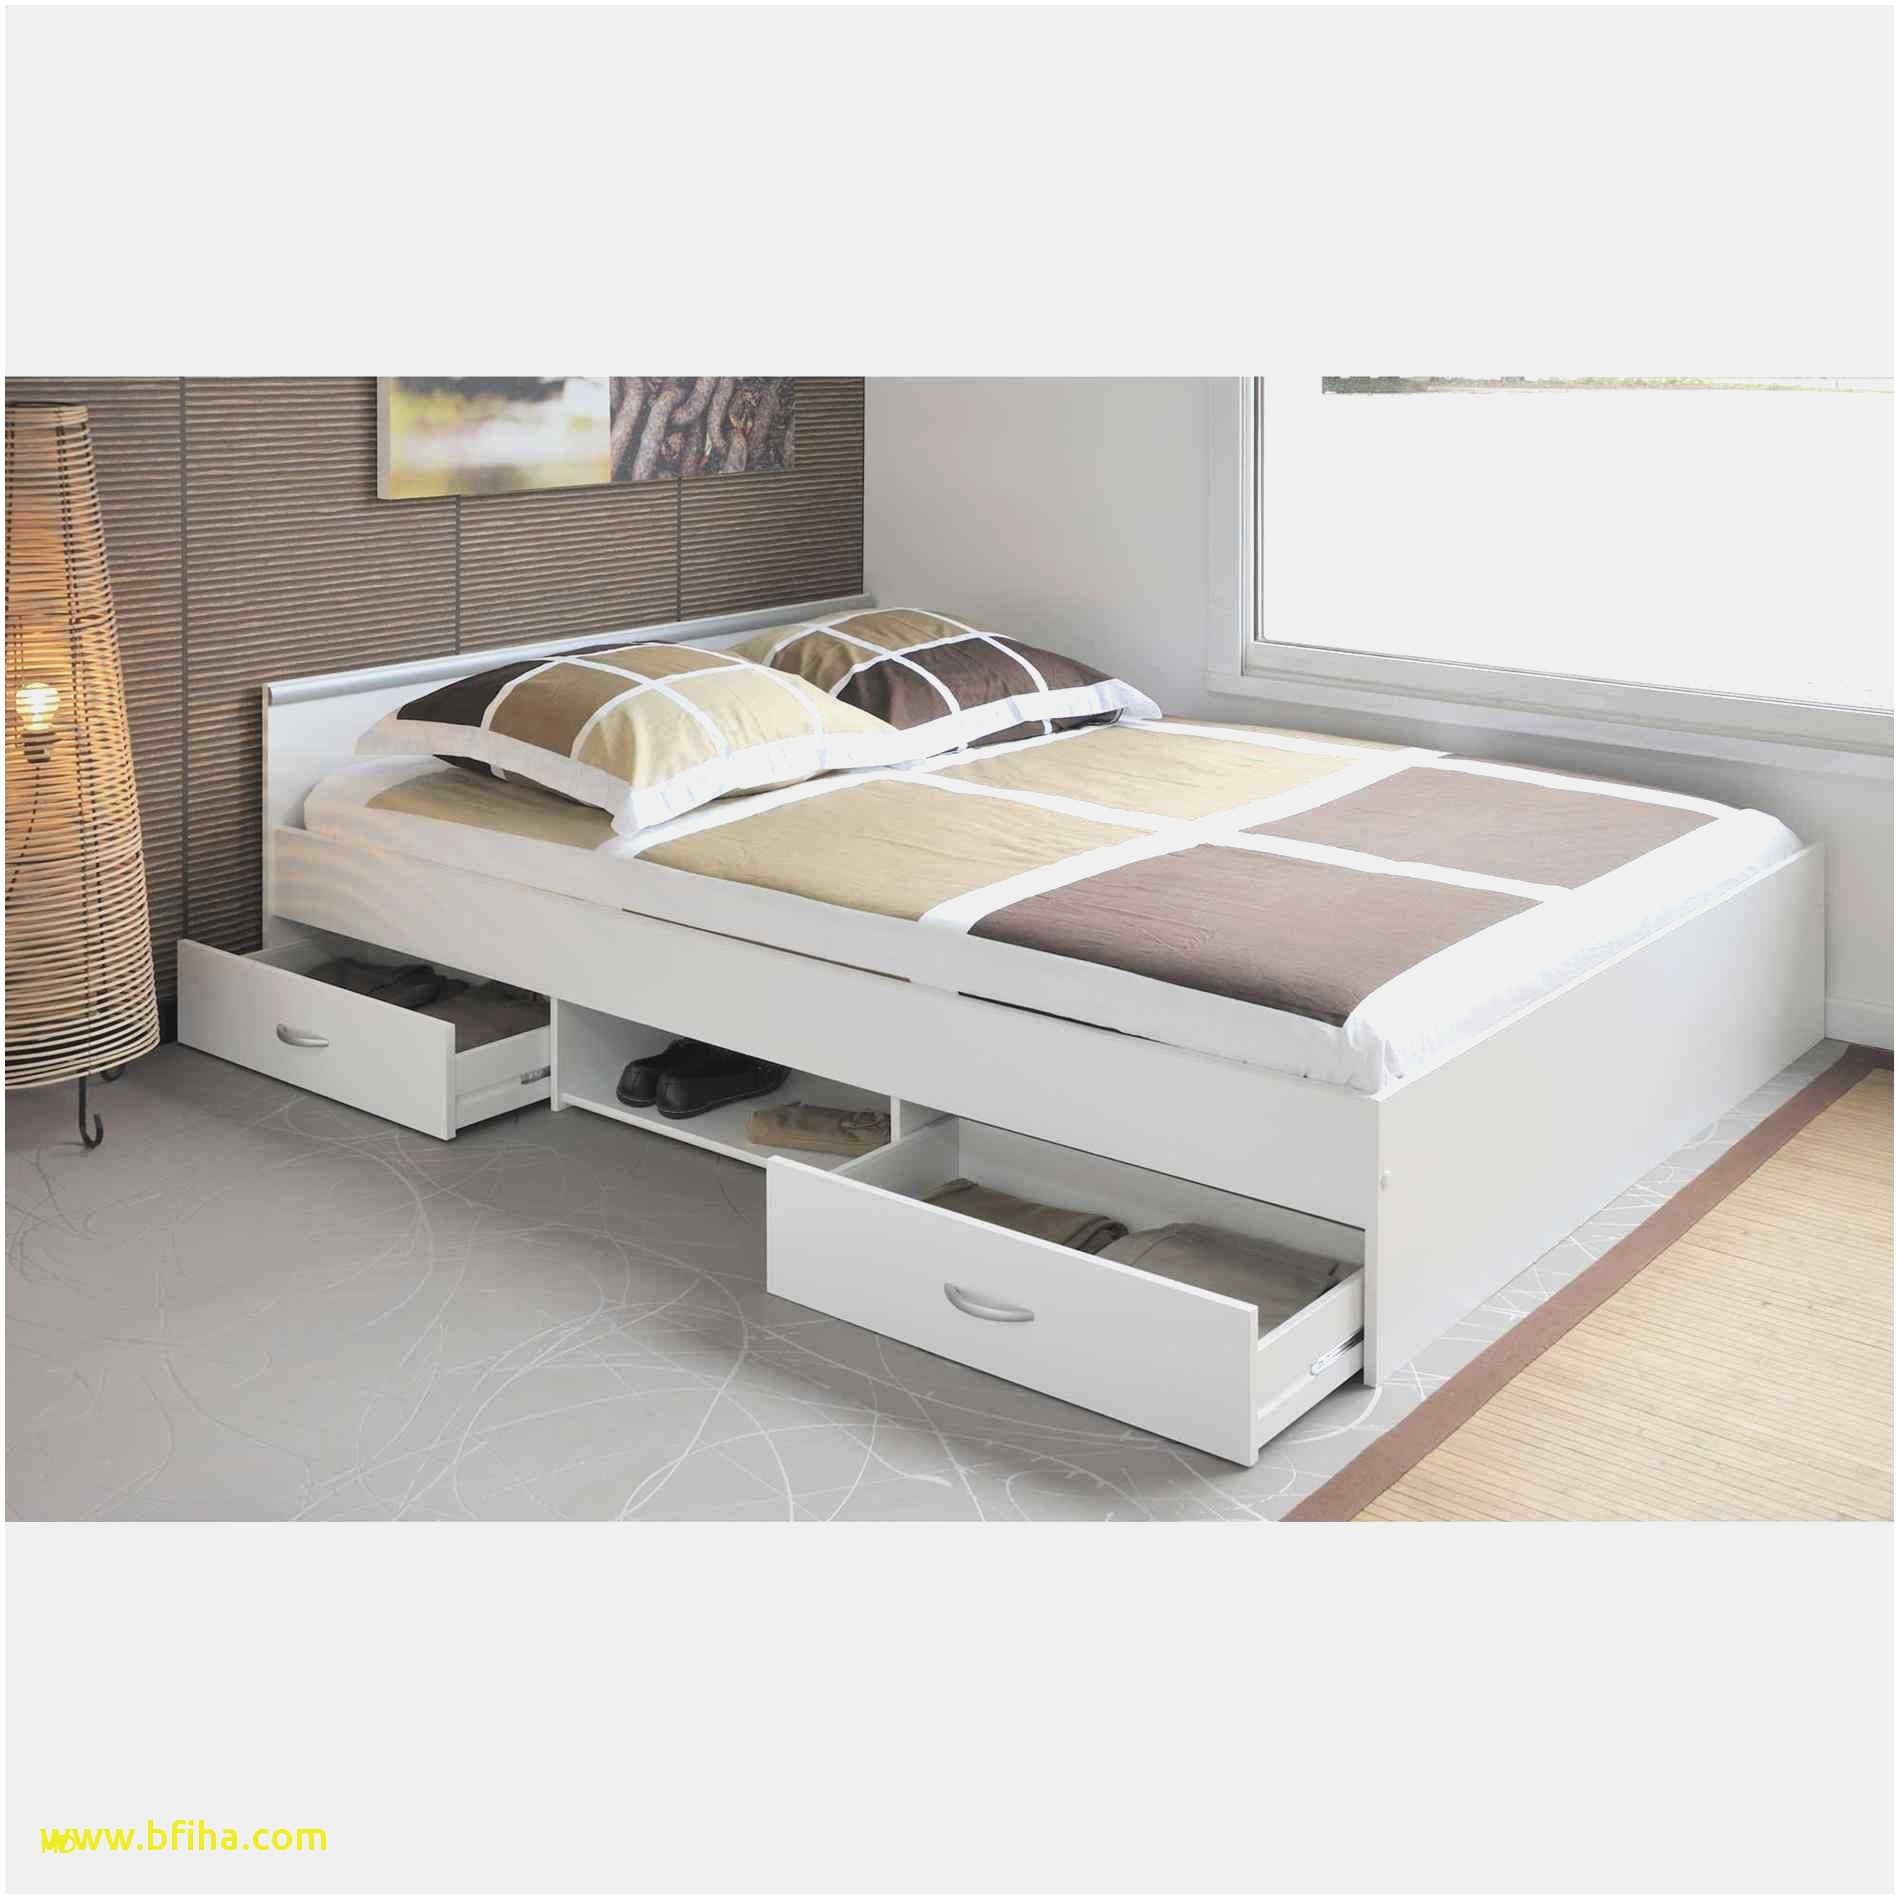 Bettgestell 1 40x2 00  Bett 120x200 Ikea